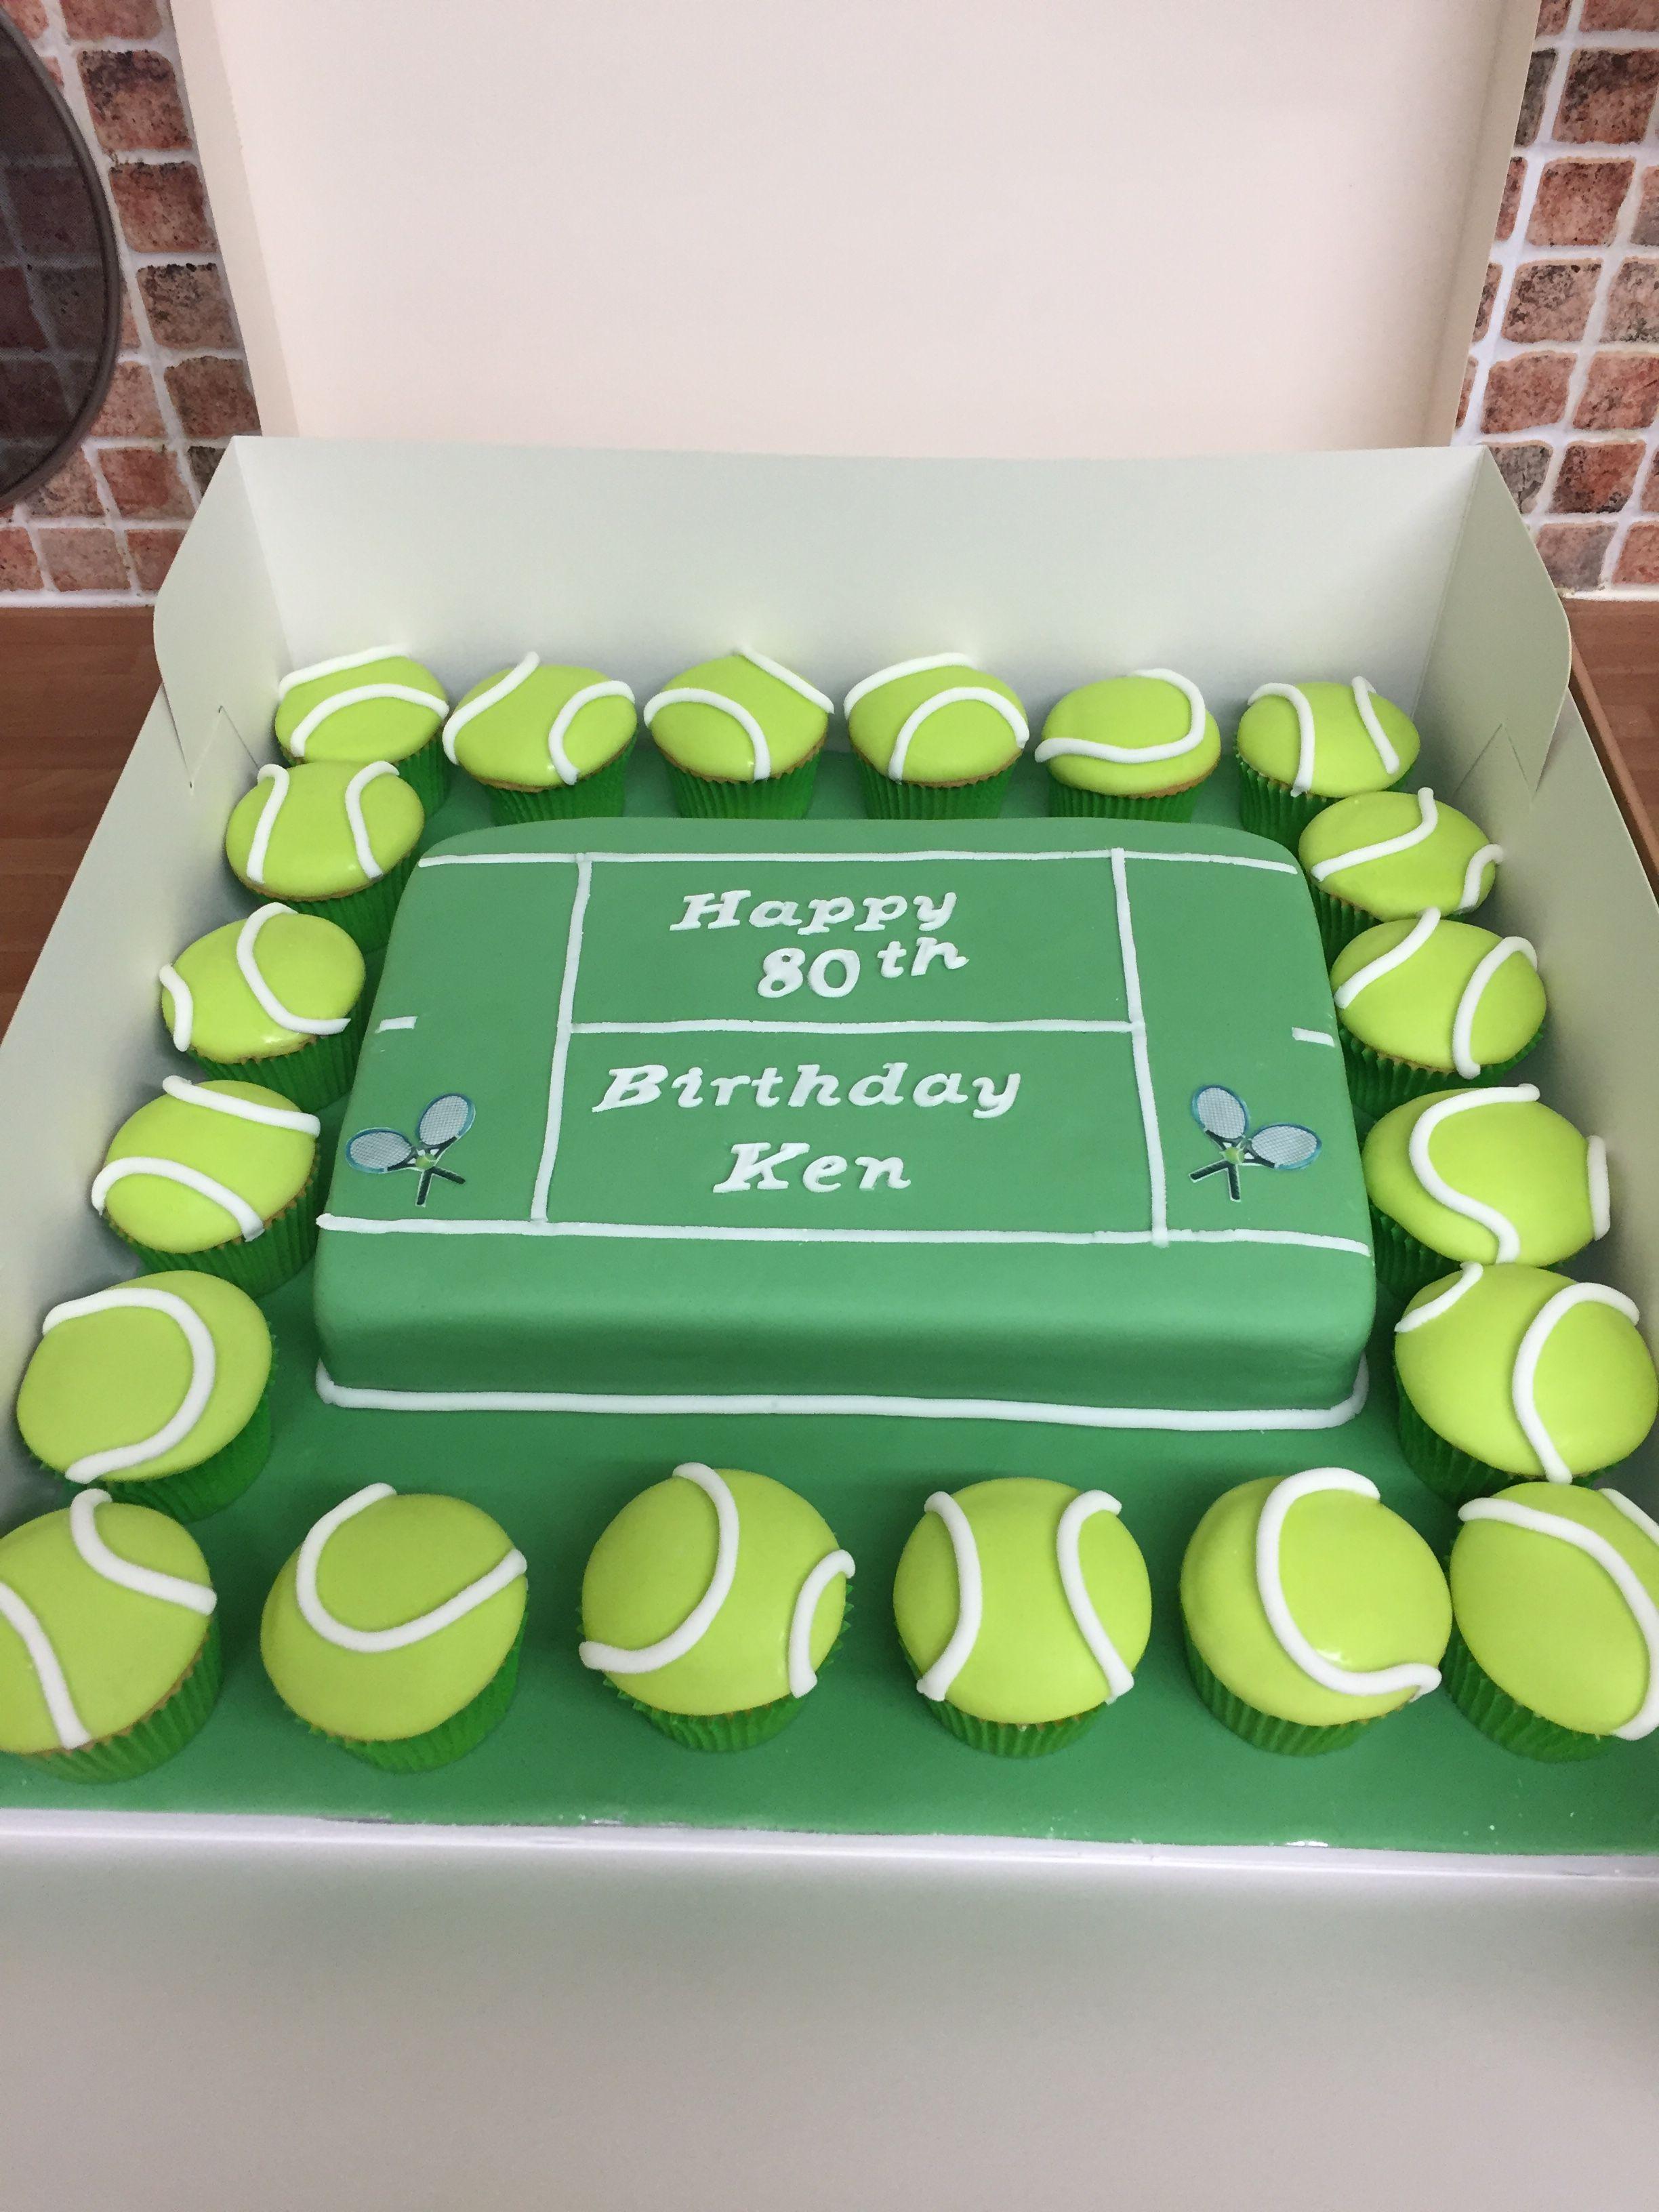 Strange Tennis Court 80Th Birthday Cake 80 Birthday Cake Fondant Cakes Funny Birthday Cards Online Alyptdamsfinfo